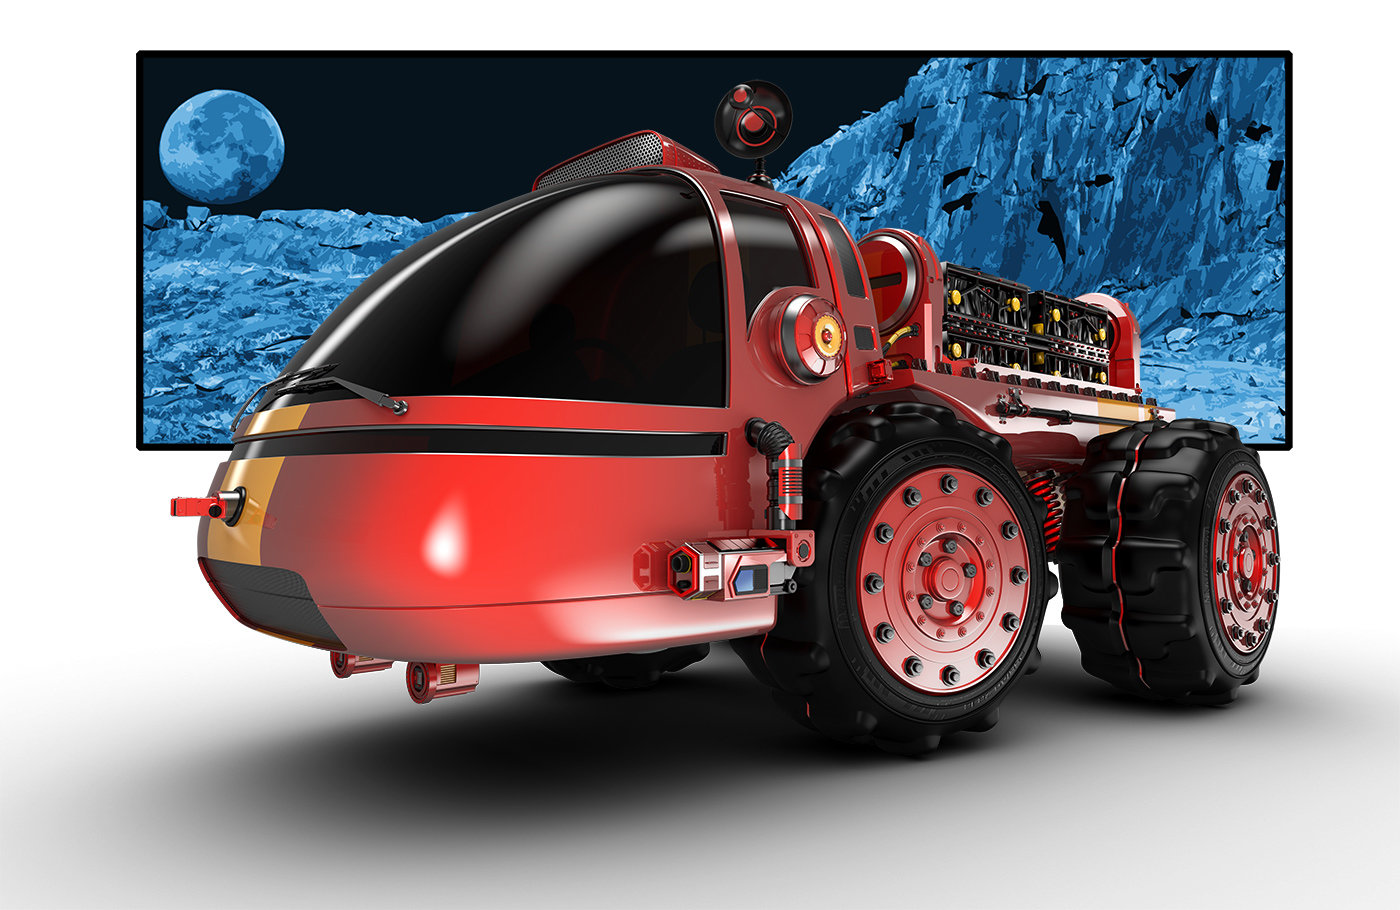 Jomar machado moon patrol com fundo